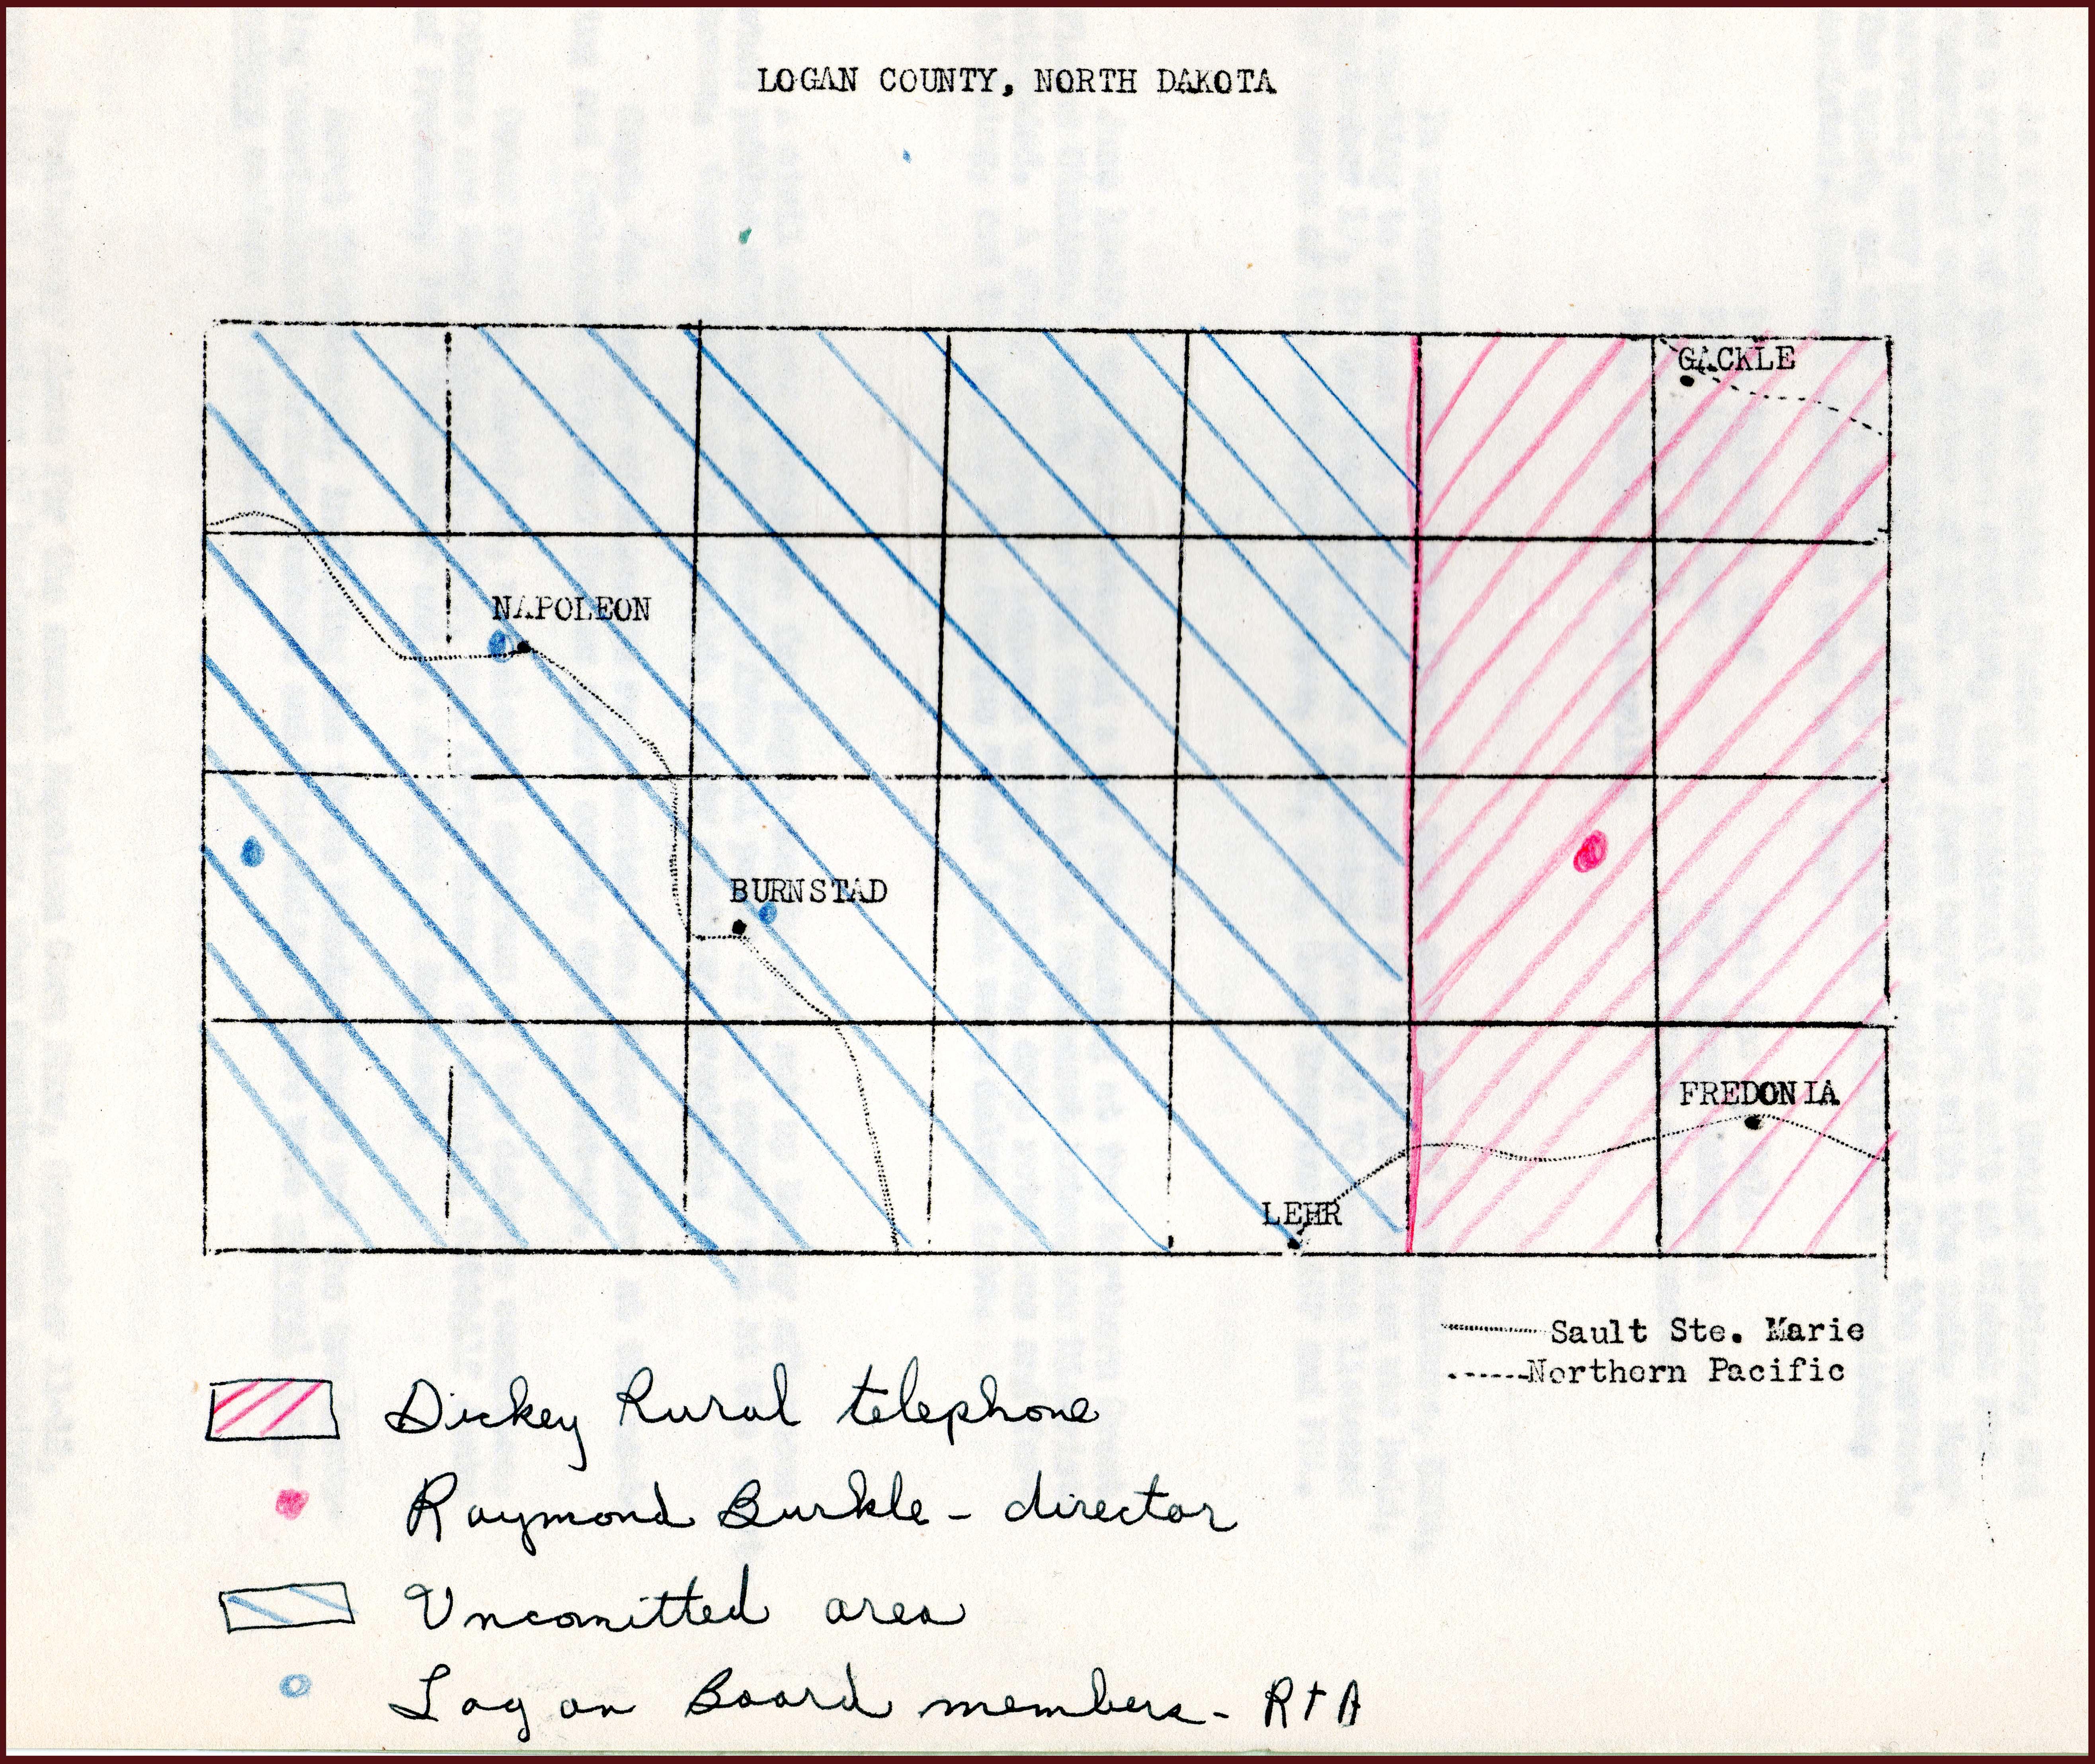 North dakota logan county fredonia - 42 Proposed Rural Telephone Coverage In Logan County